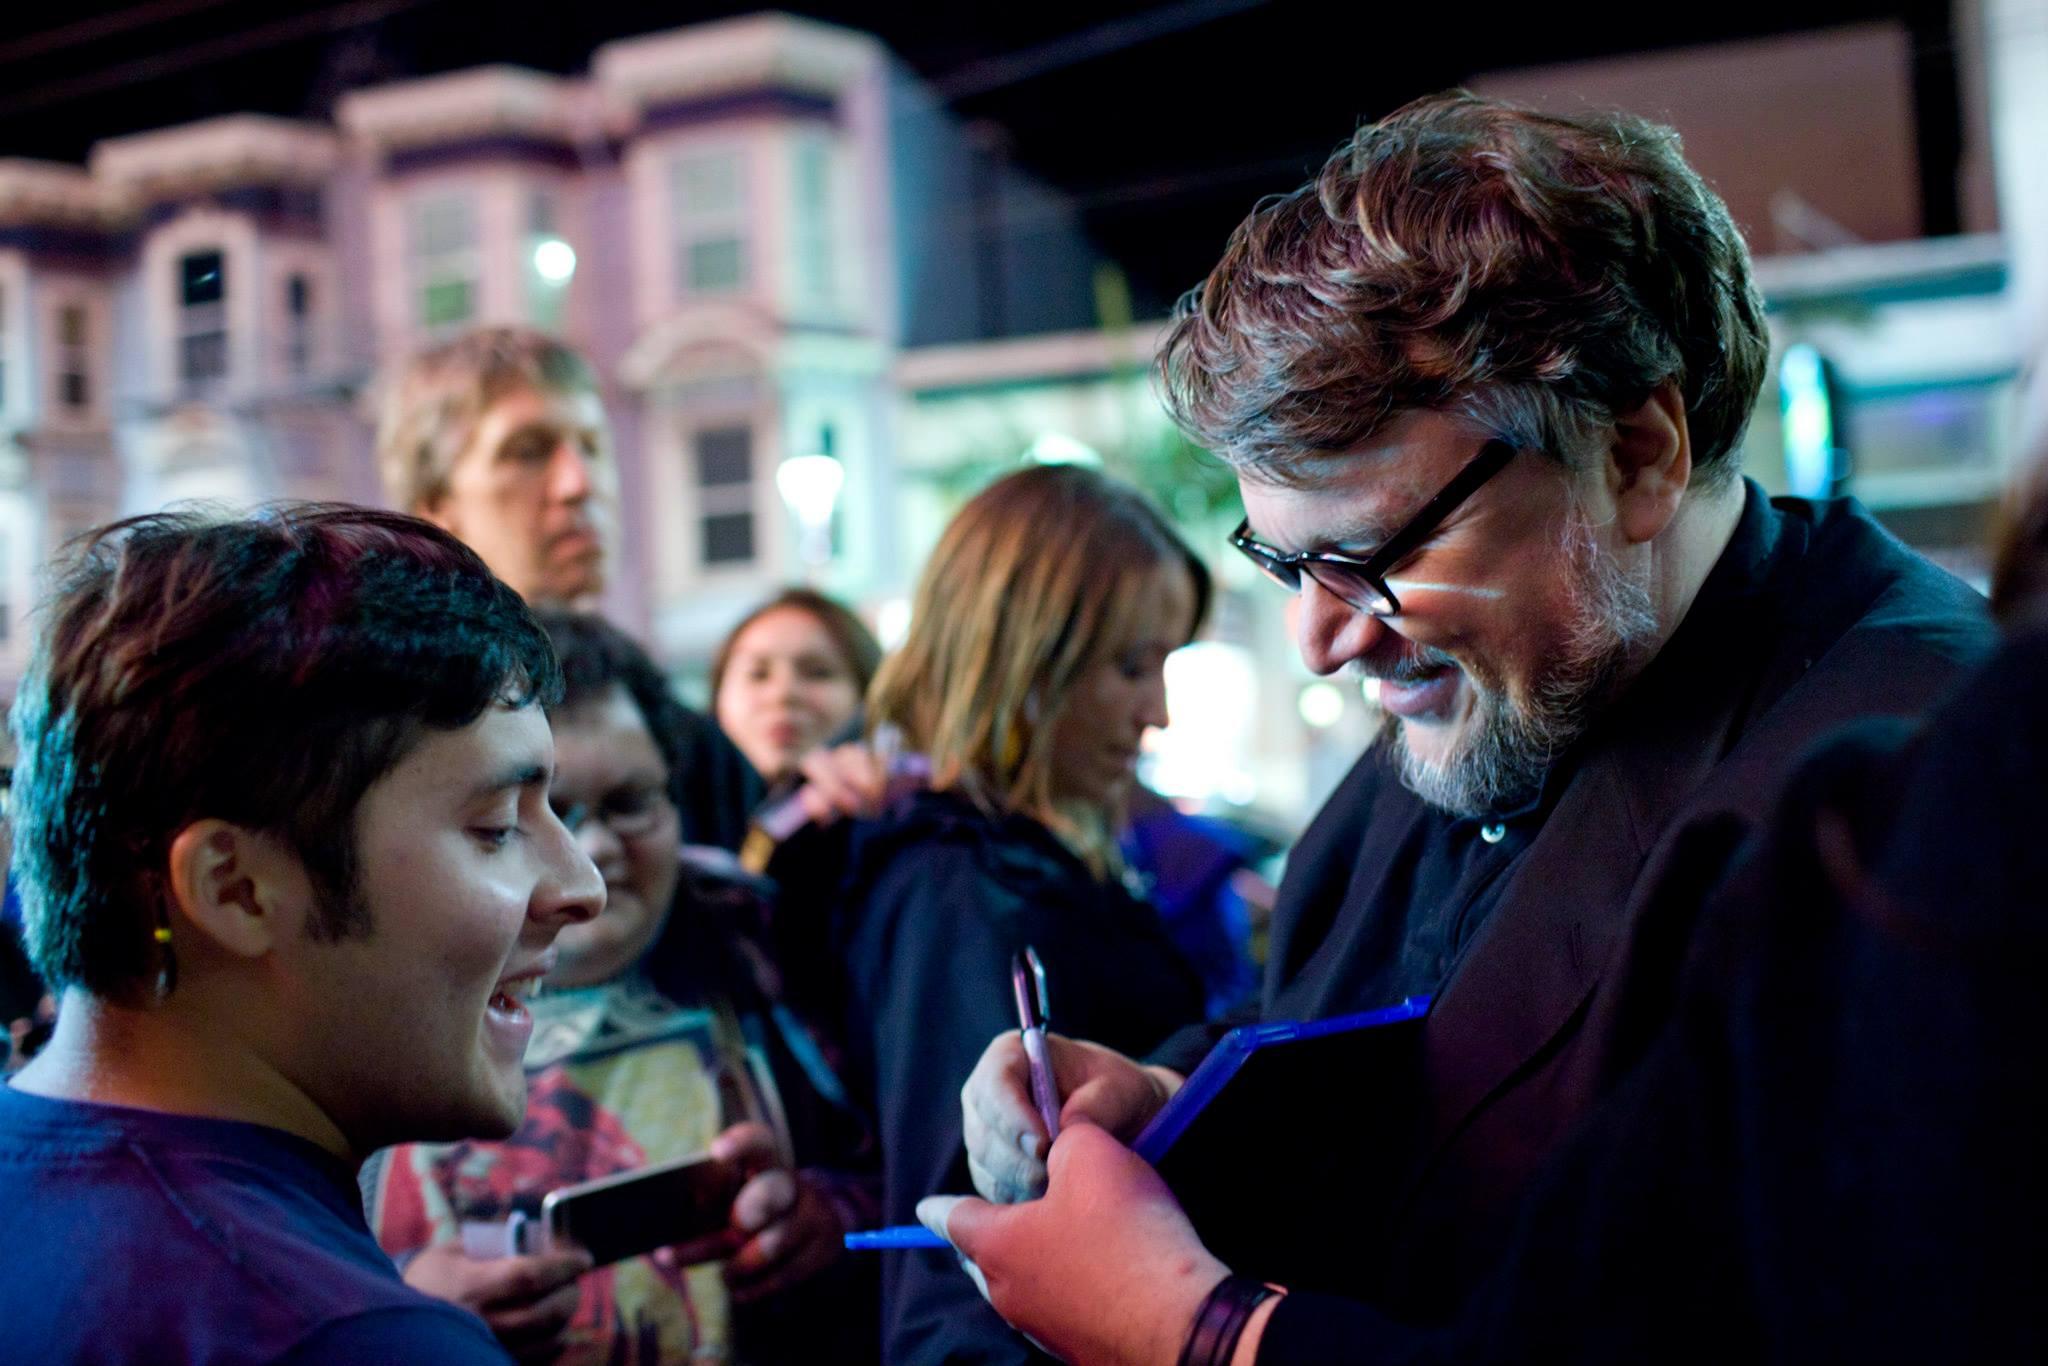 Guillermo del Toro, recipient of SFIFF58's Irving M. Levin Directing Award